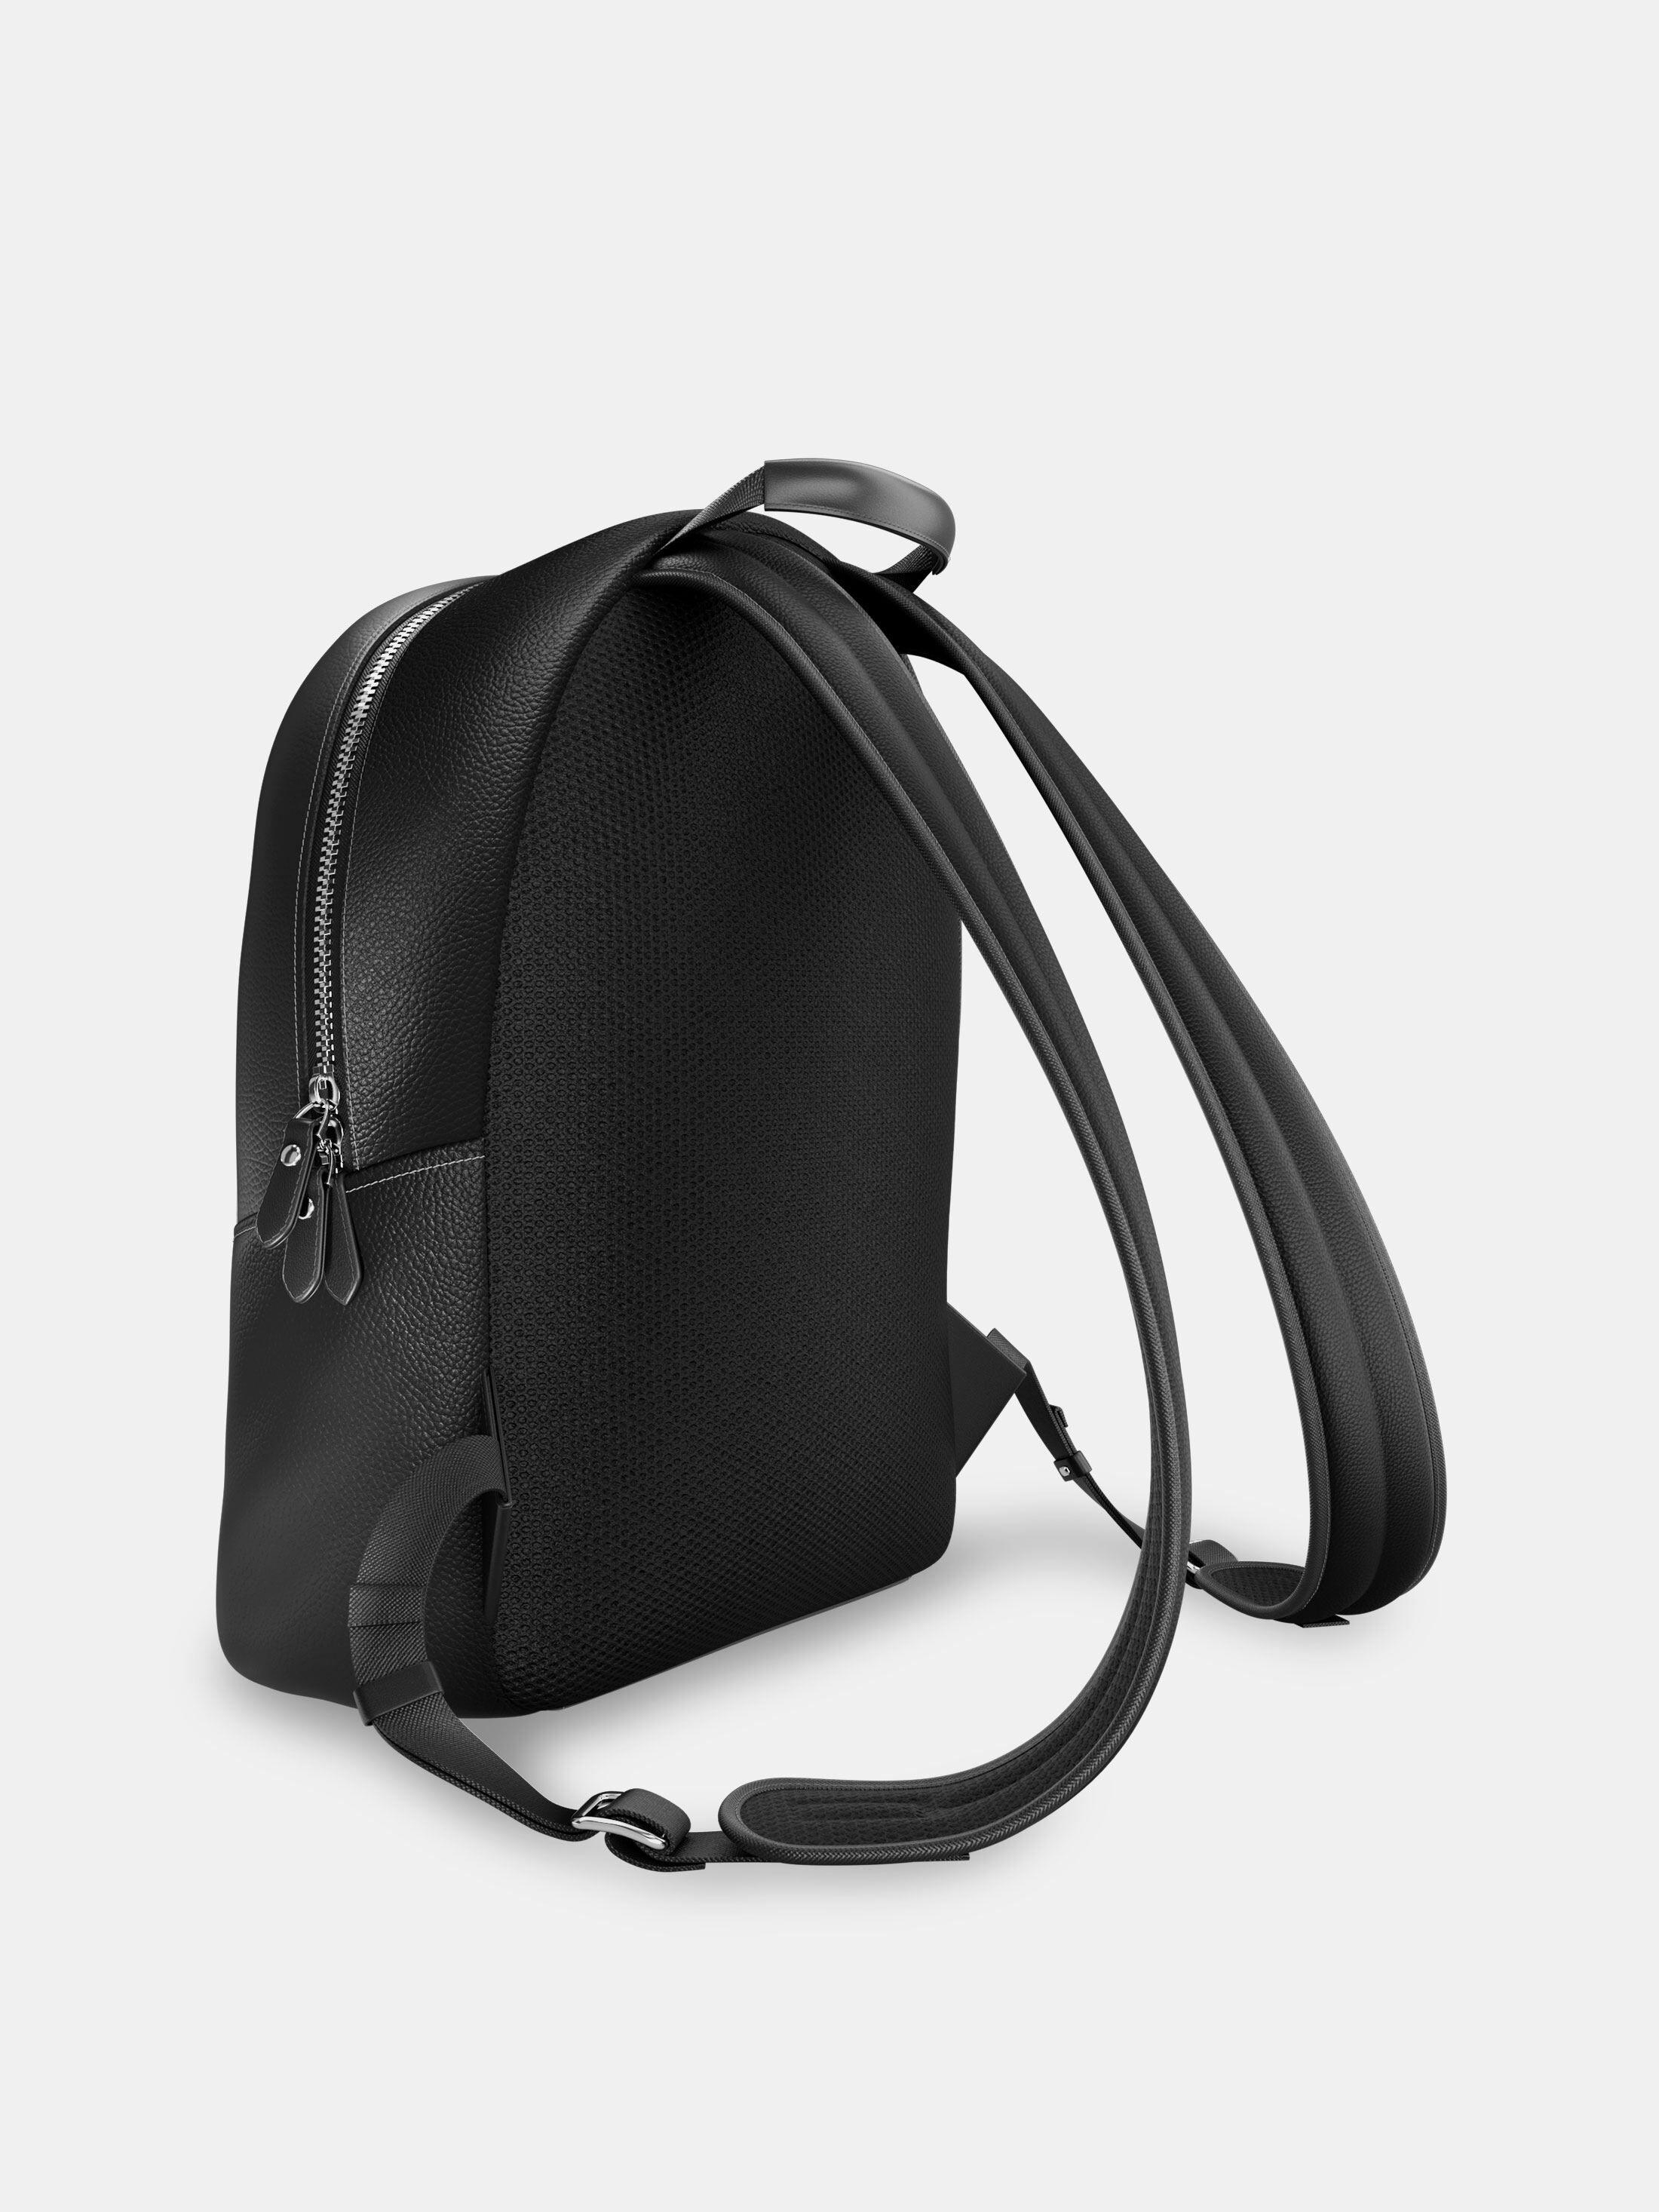 design custom leather backpack